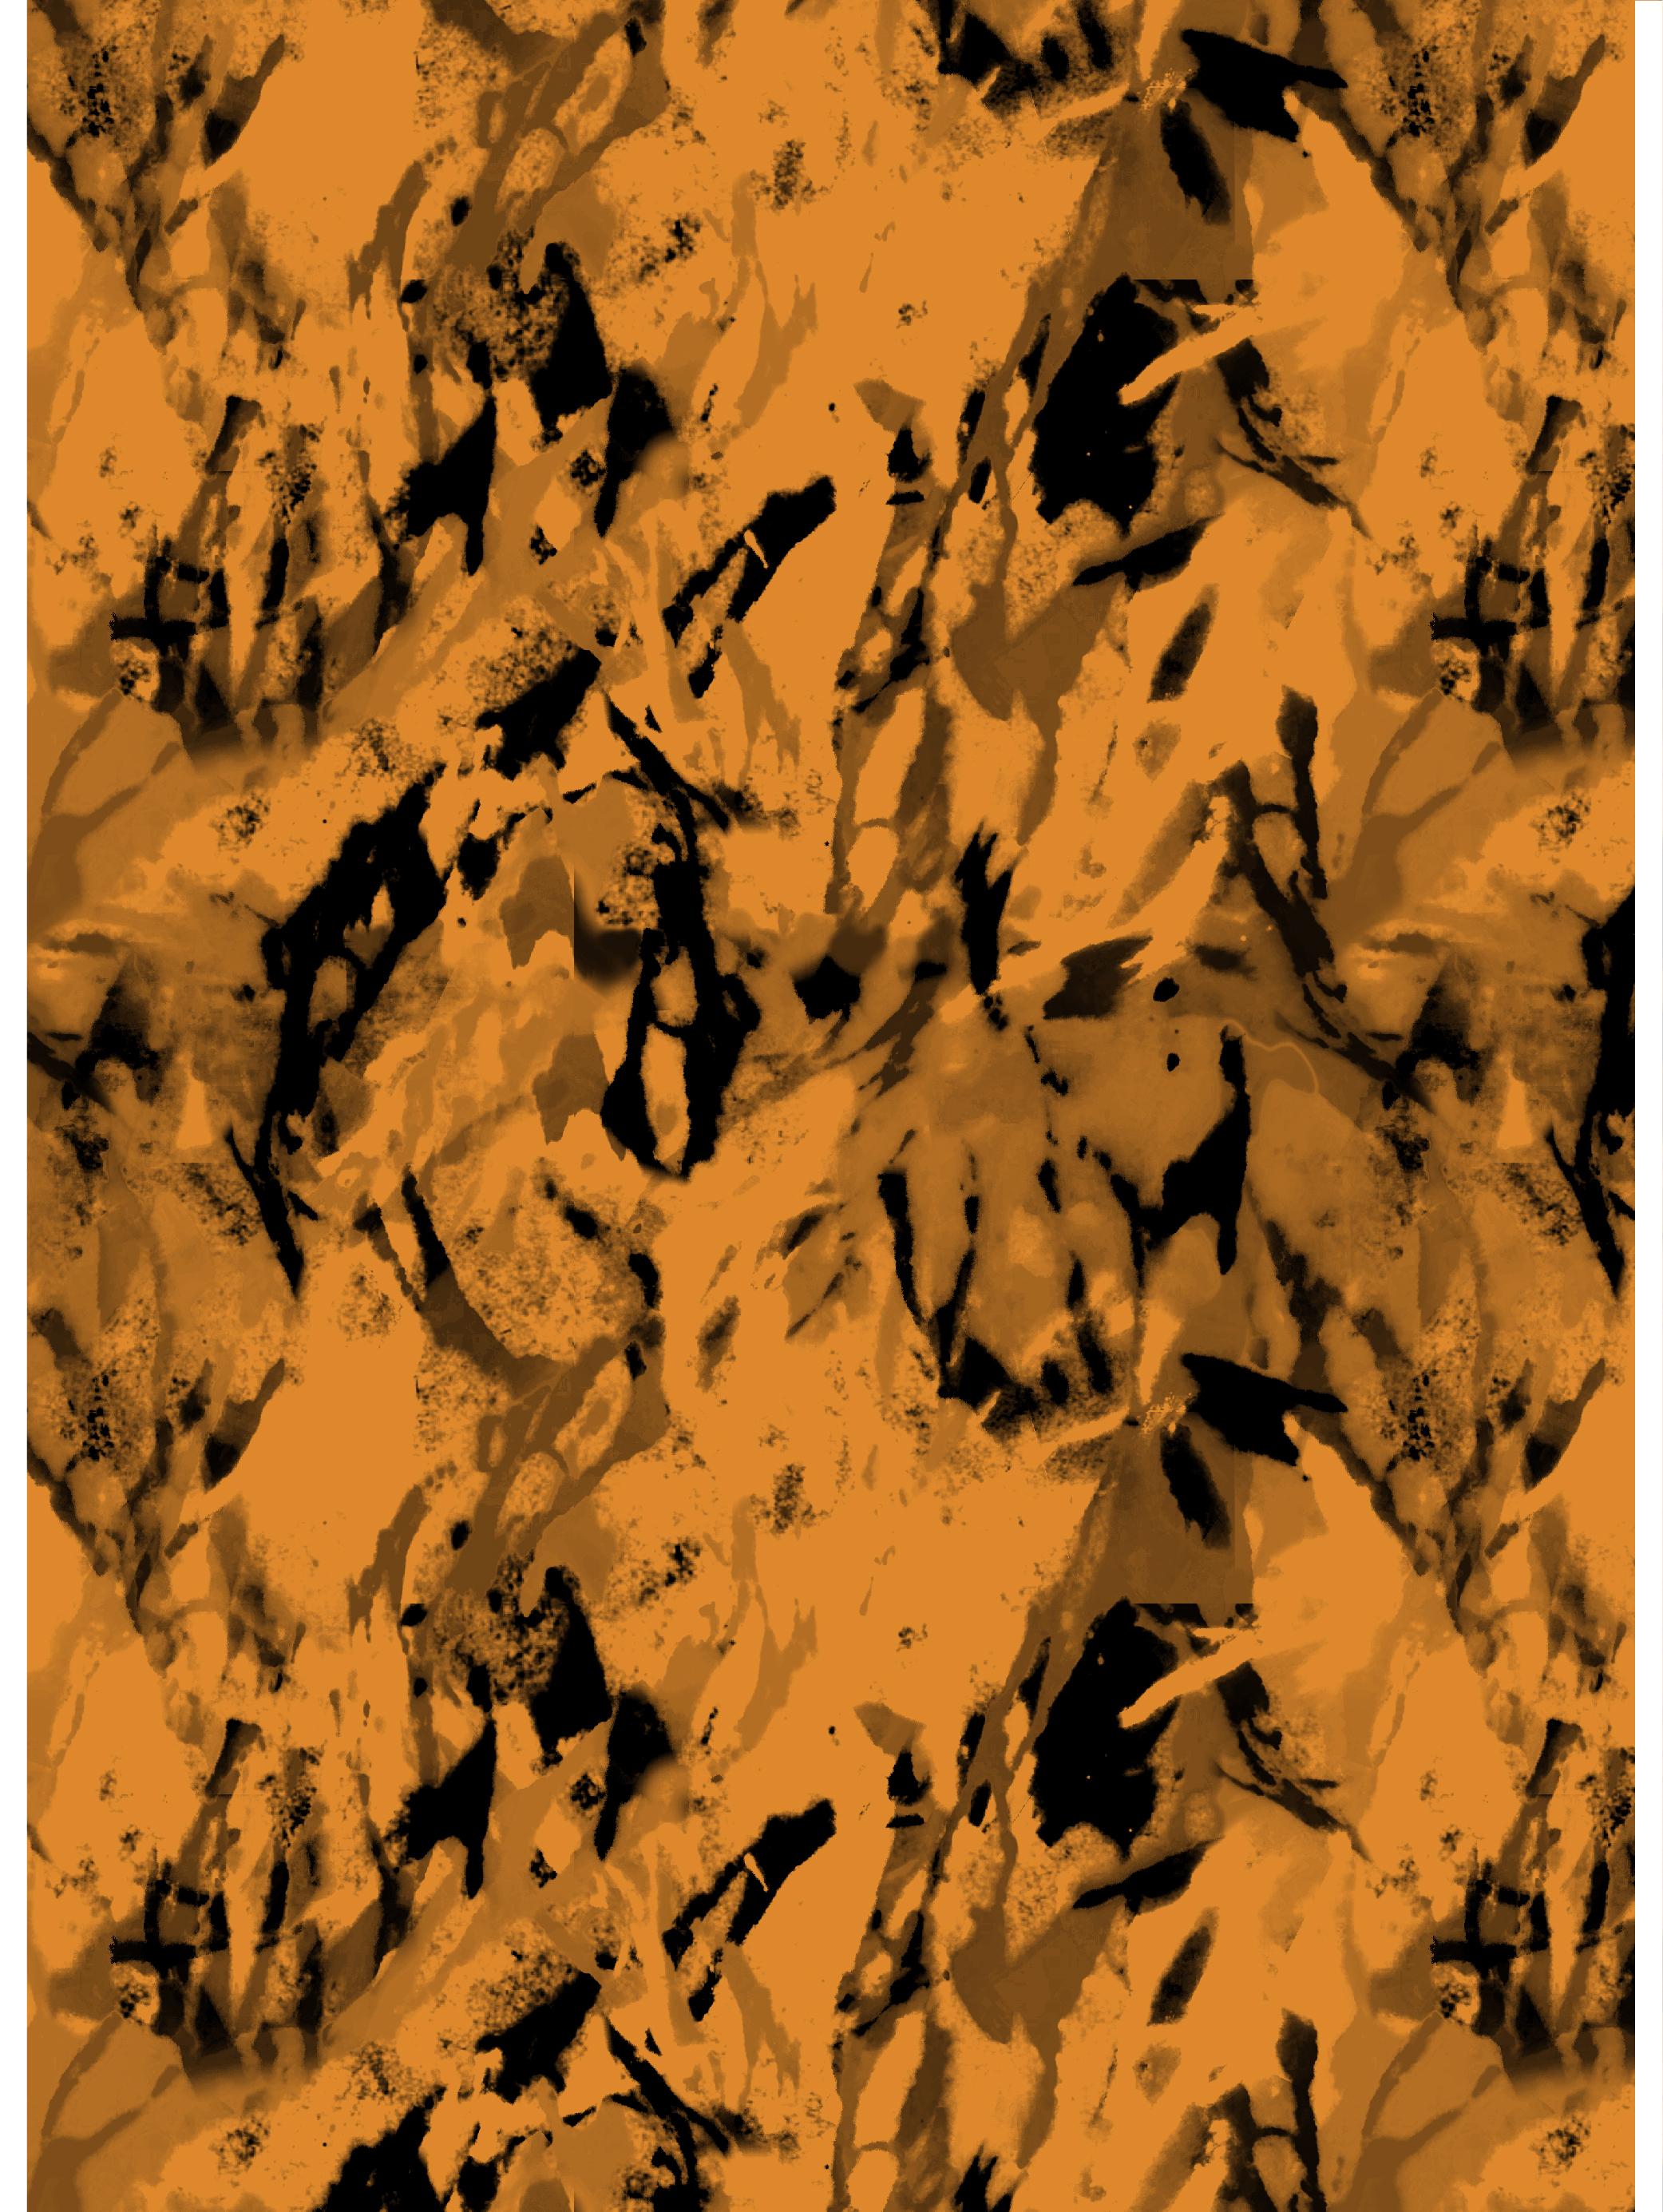 prints-02.jpg